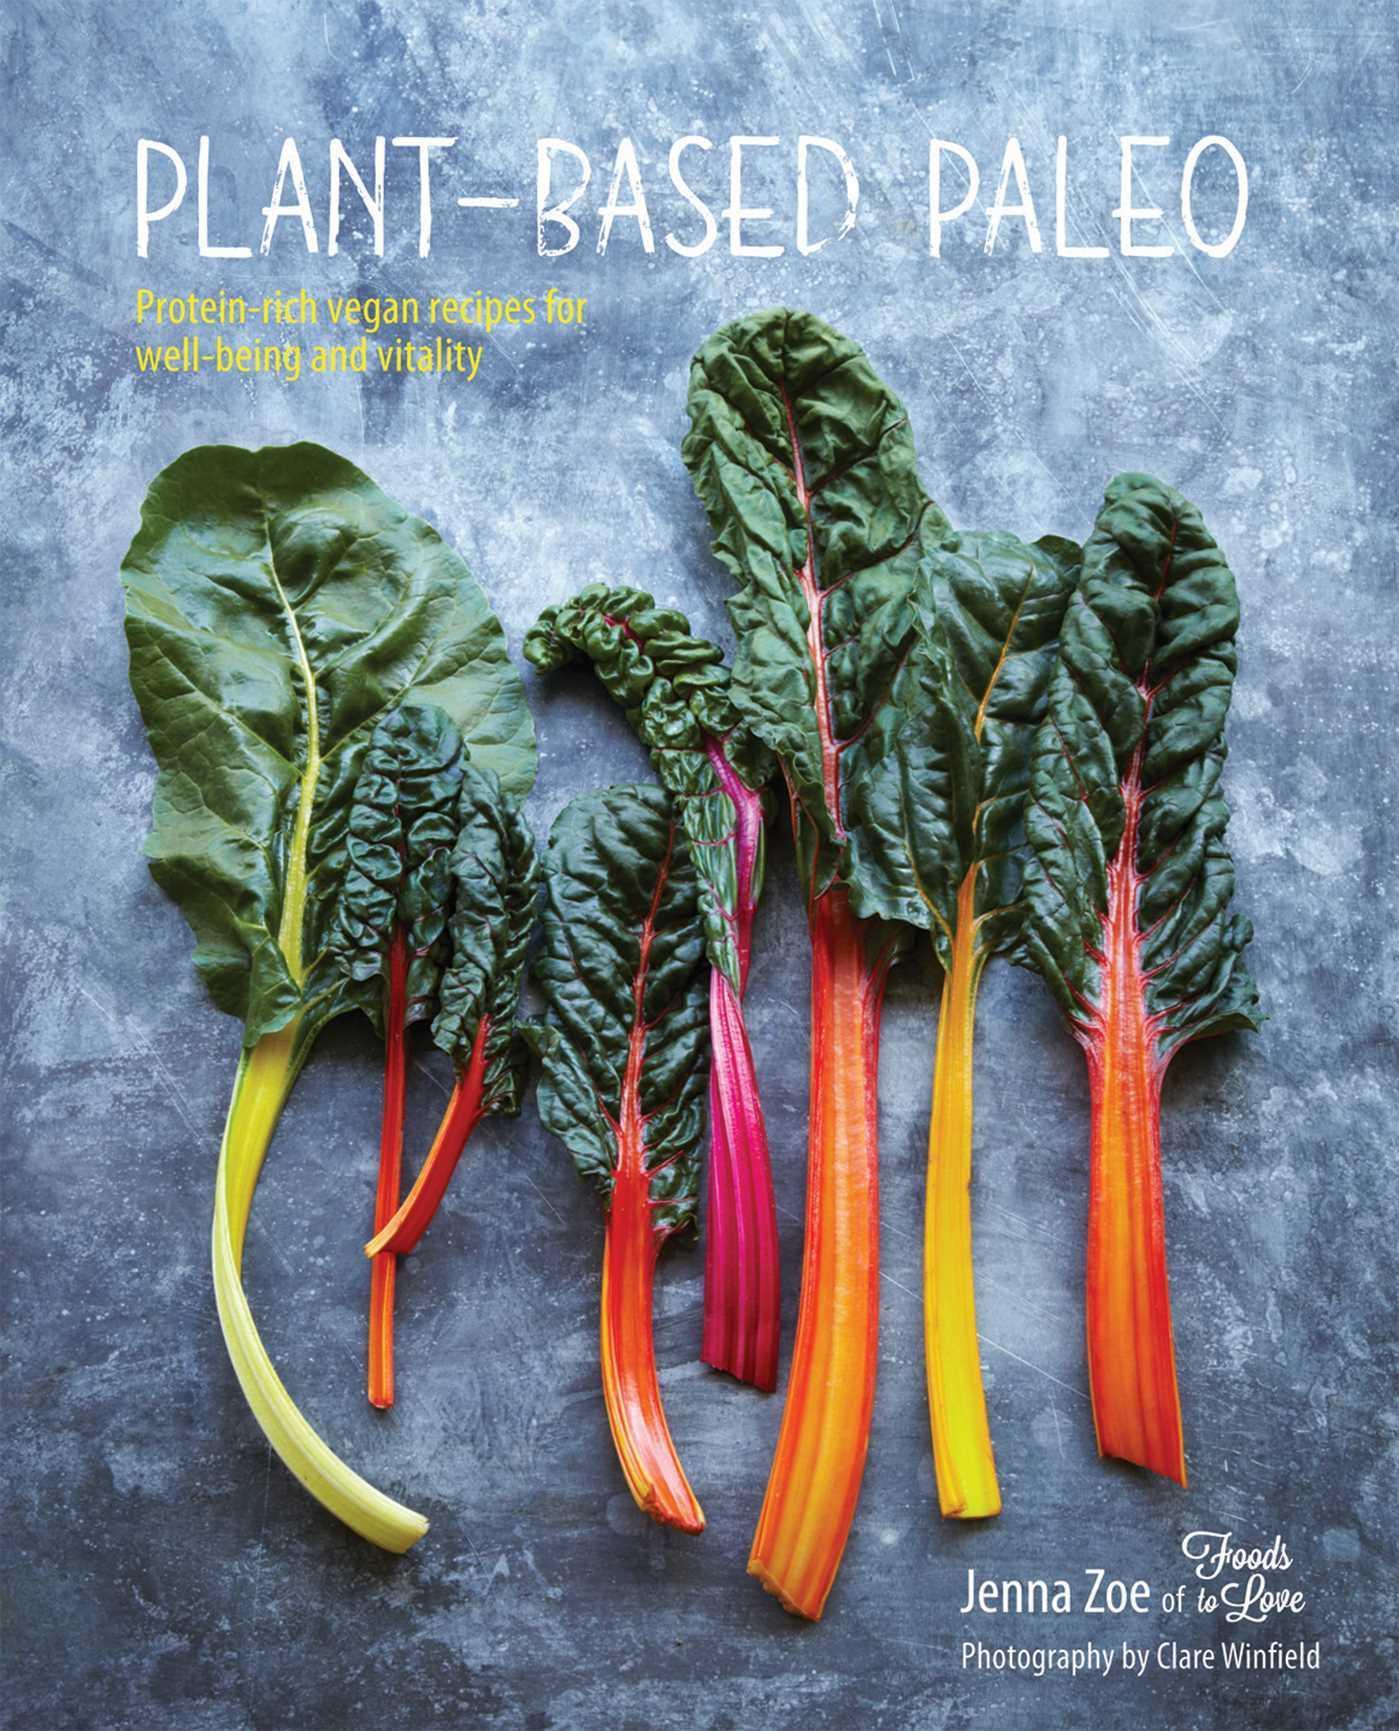 Plant-based Paleo Zoe Jenna